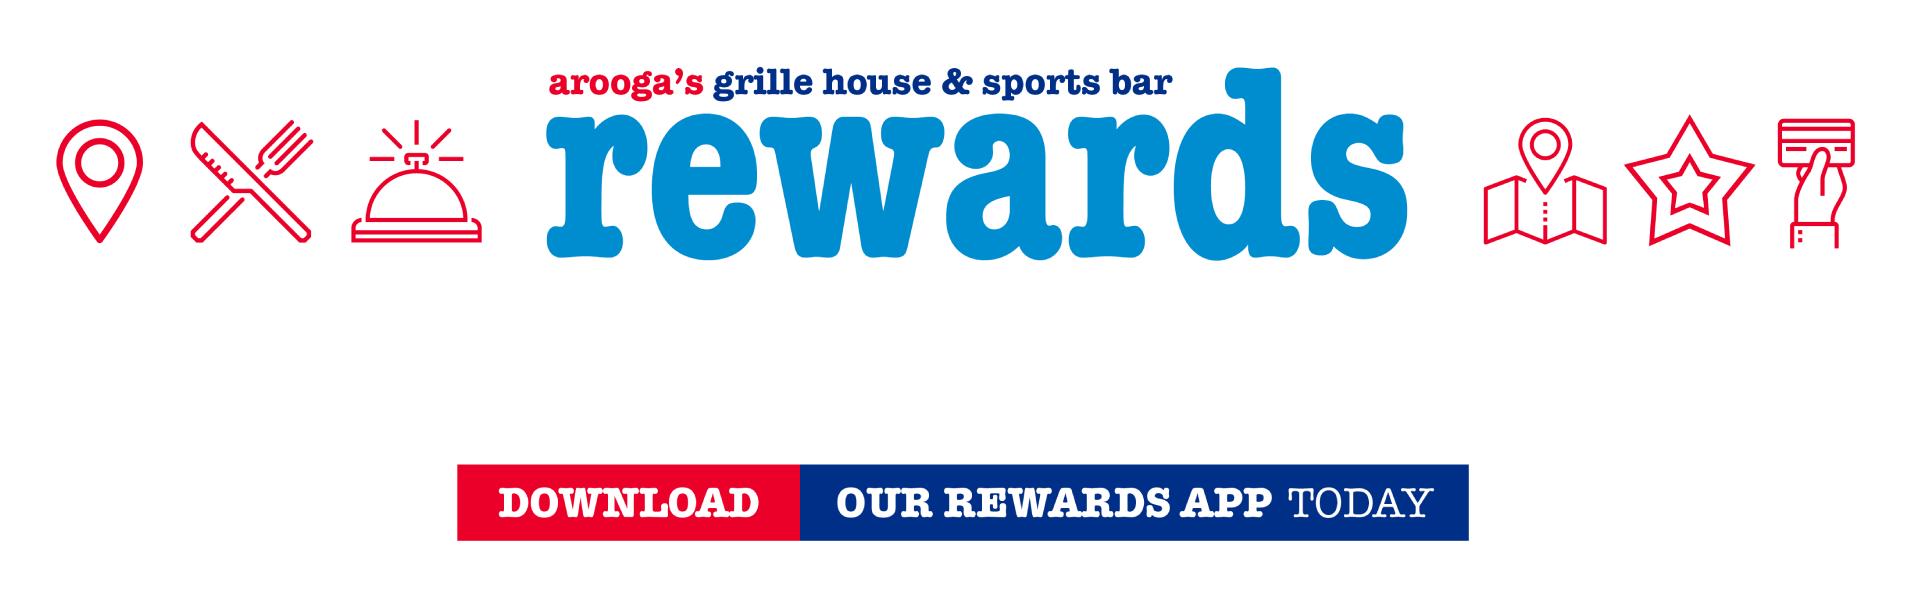 Aroogas Rewards and App